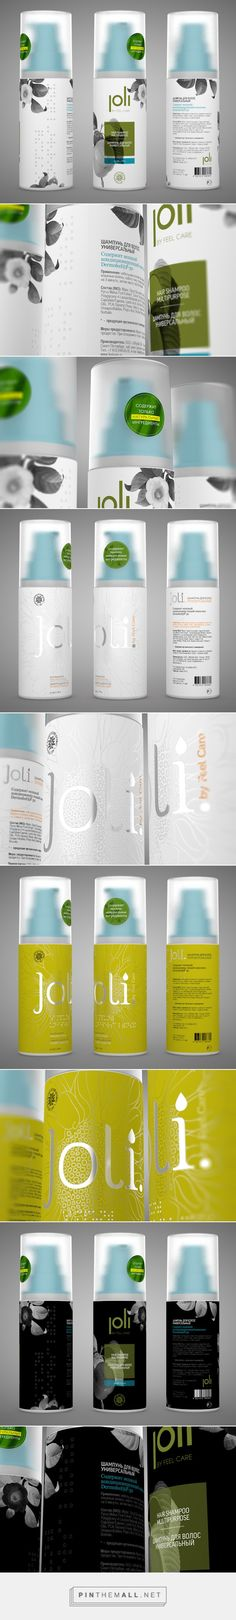 Joli Brand Shampoo Package by Yegor Trukhin | Fivestar Branding – Design and Branding Agency & Inspiration Gallery - created via https://pinthemall.net